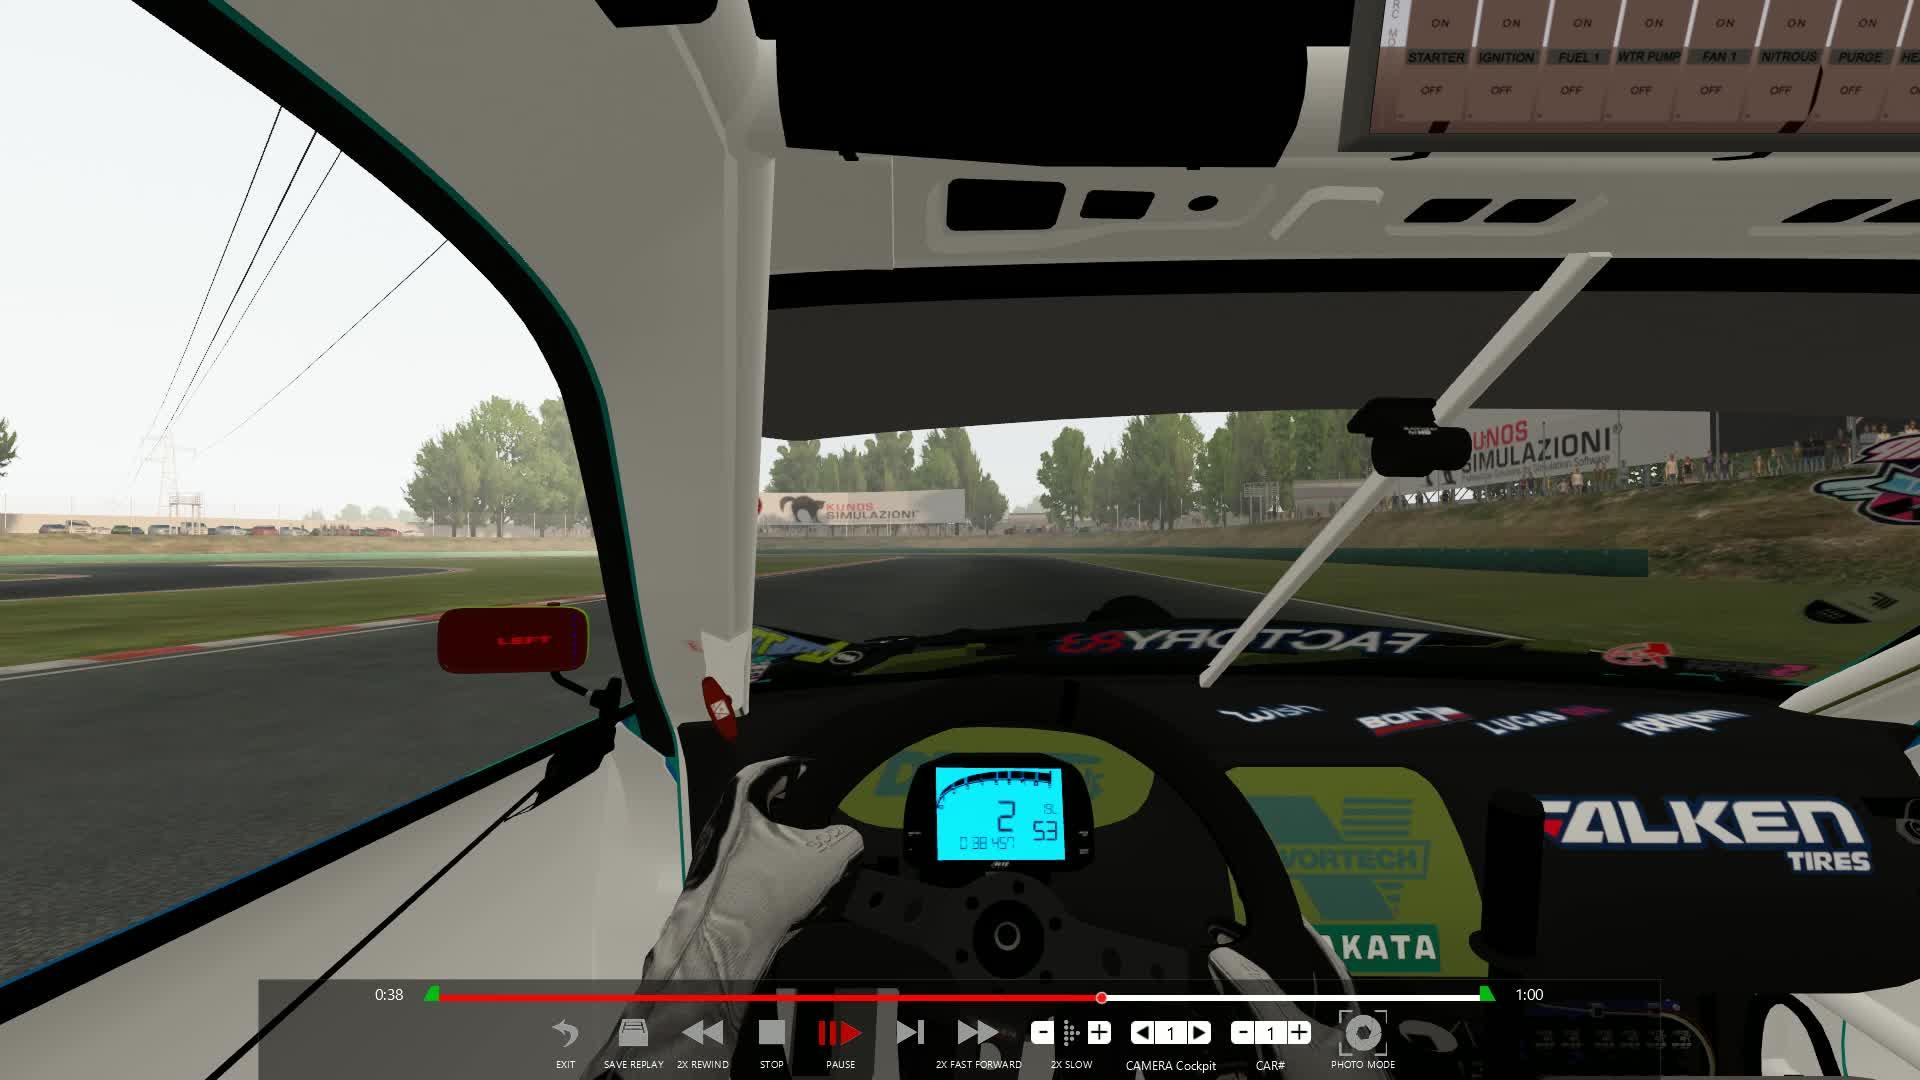 ac, assettocorsa, drift, fd, formulad, formuladrift, s14, smooth, transitions, wheel, Improvement Cockpit Cam GIFs